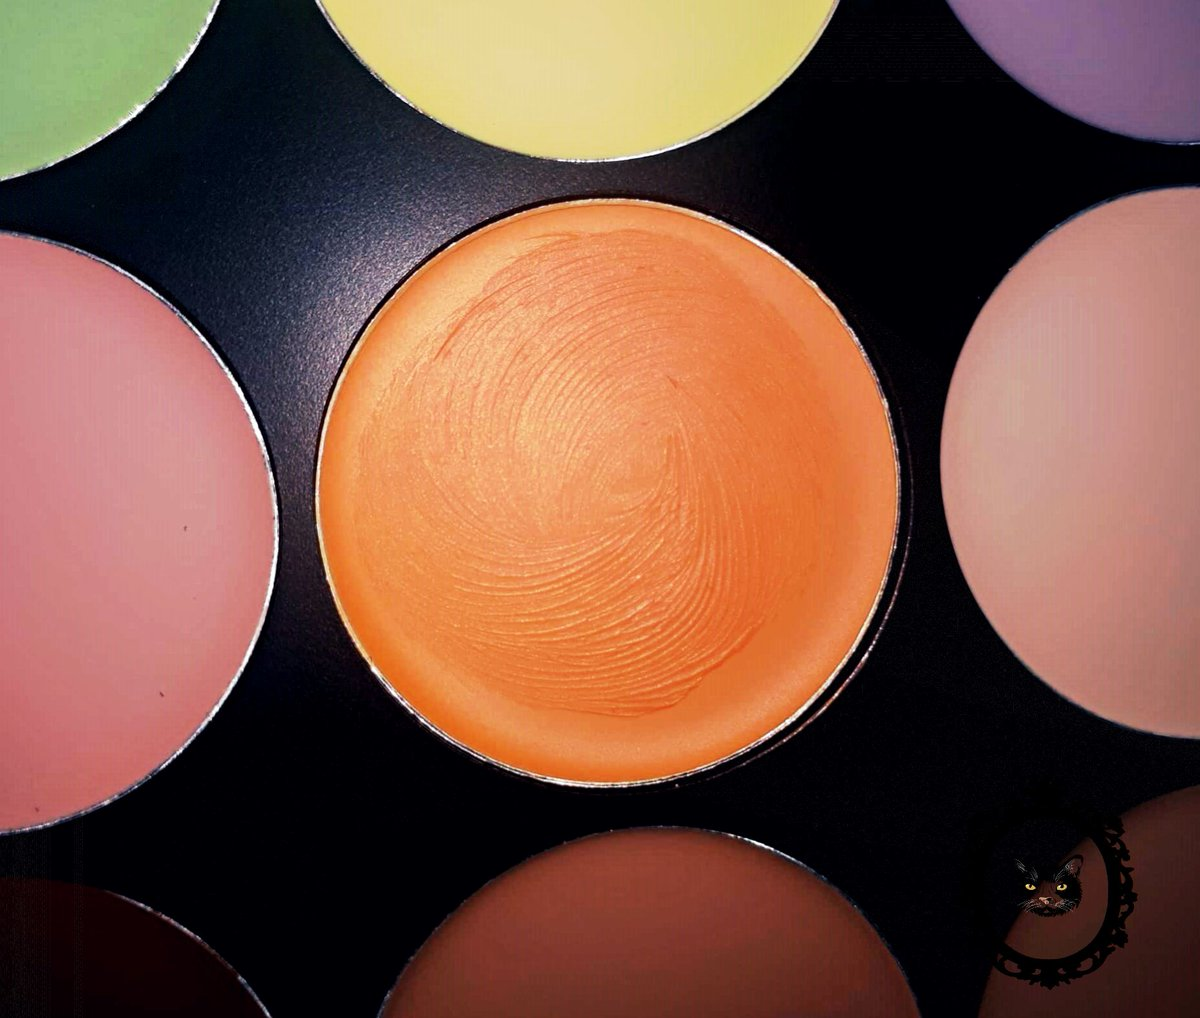 https://tzotzosworld.blogspot.com/2019/12/blog-post_26.html… New #blogpost !Favorite orange product! @ElixirLondon  #elixirmakeup #blogger #greekblogger #BeautyBloggers #makeupblog #makeup #favorite #makeupproductpic.twitter.com/jI7Uu5Beb0